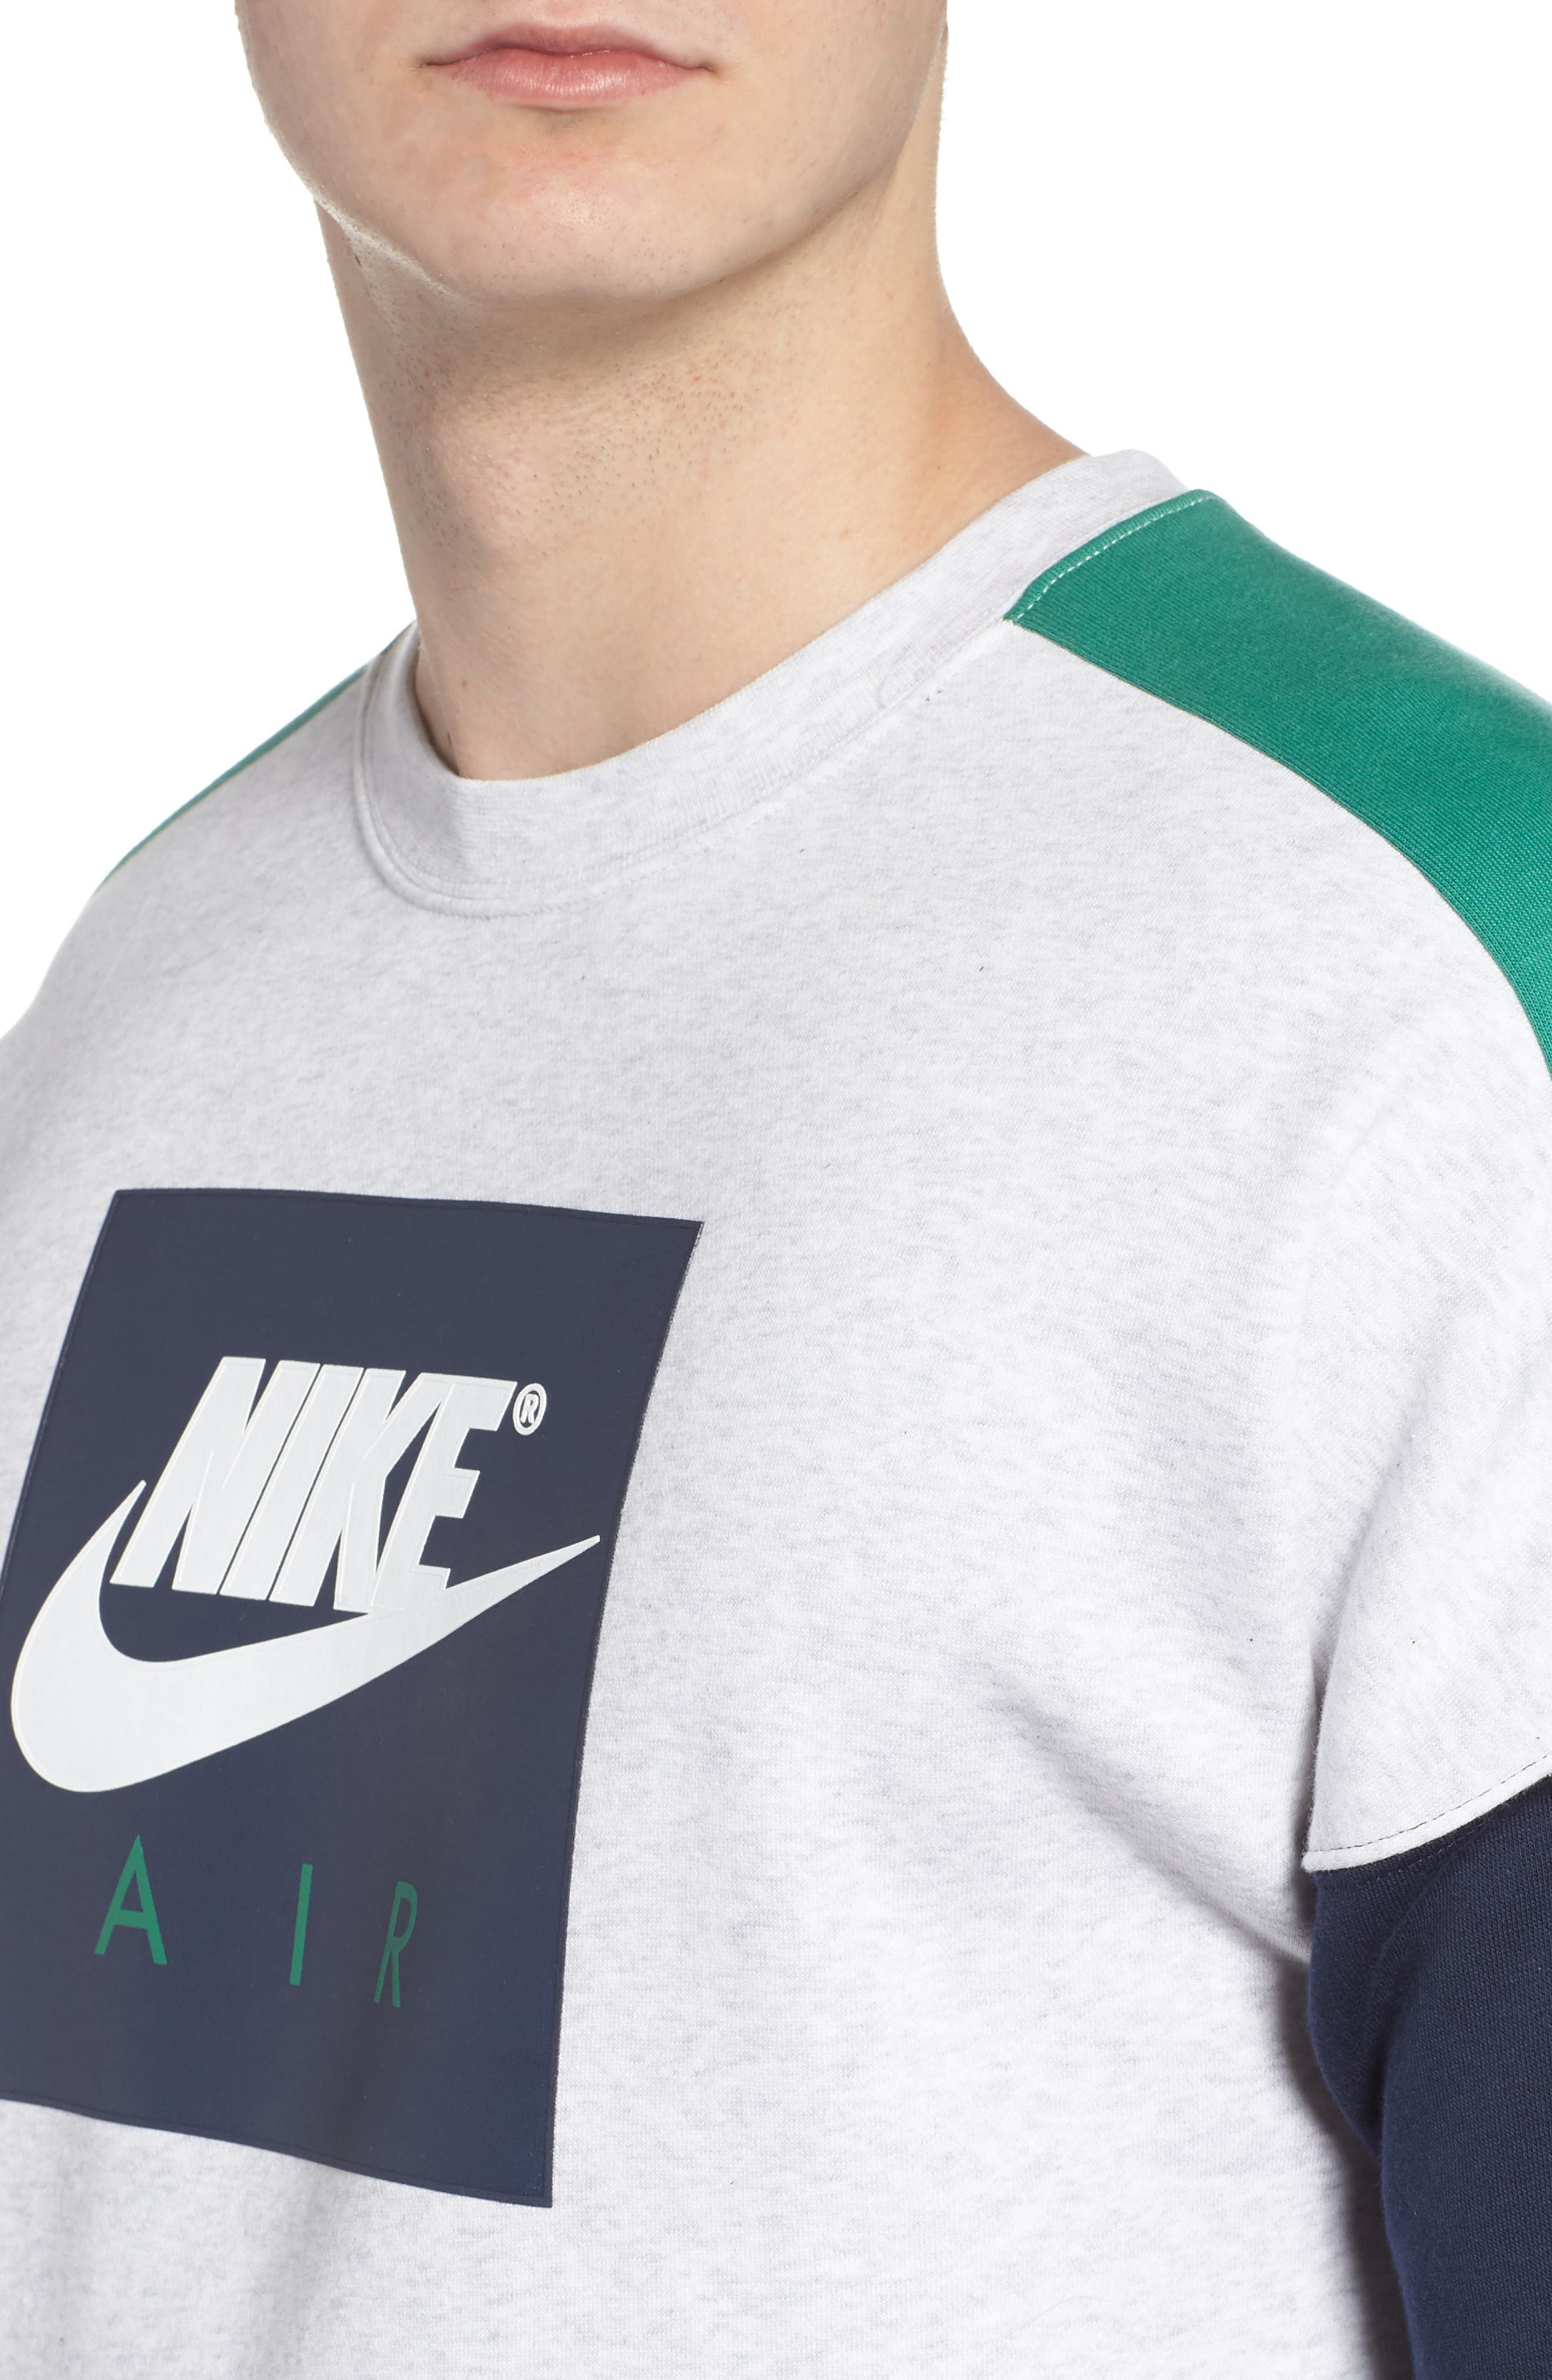 NSW Air Crewneck Sweatshirt,                             Alternate thumbnail 4, color,                             Birch/ Green/ Obsidian/ White